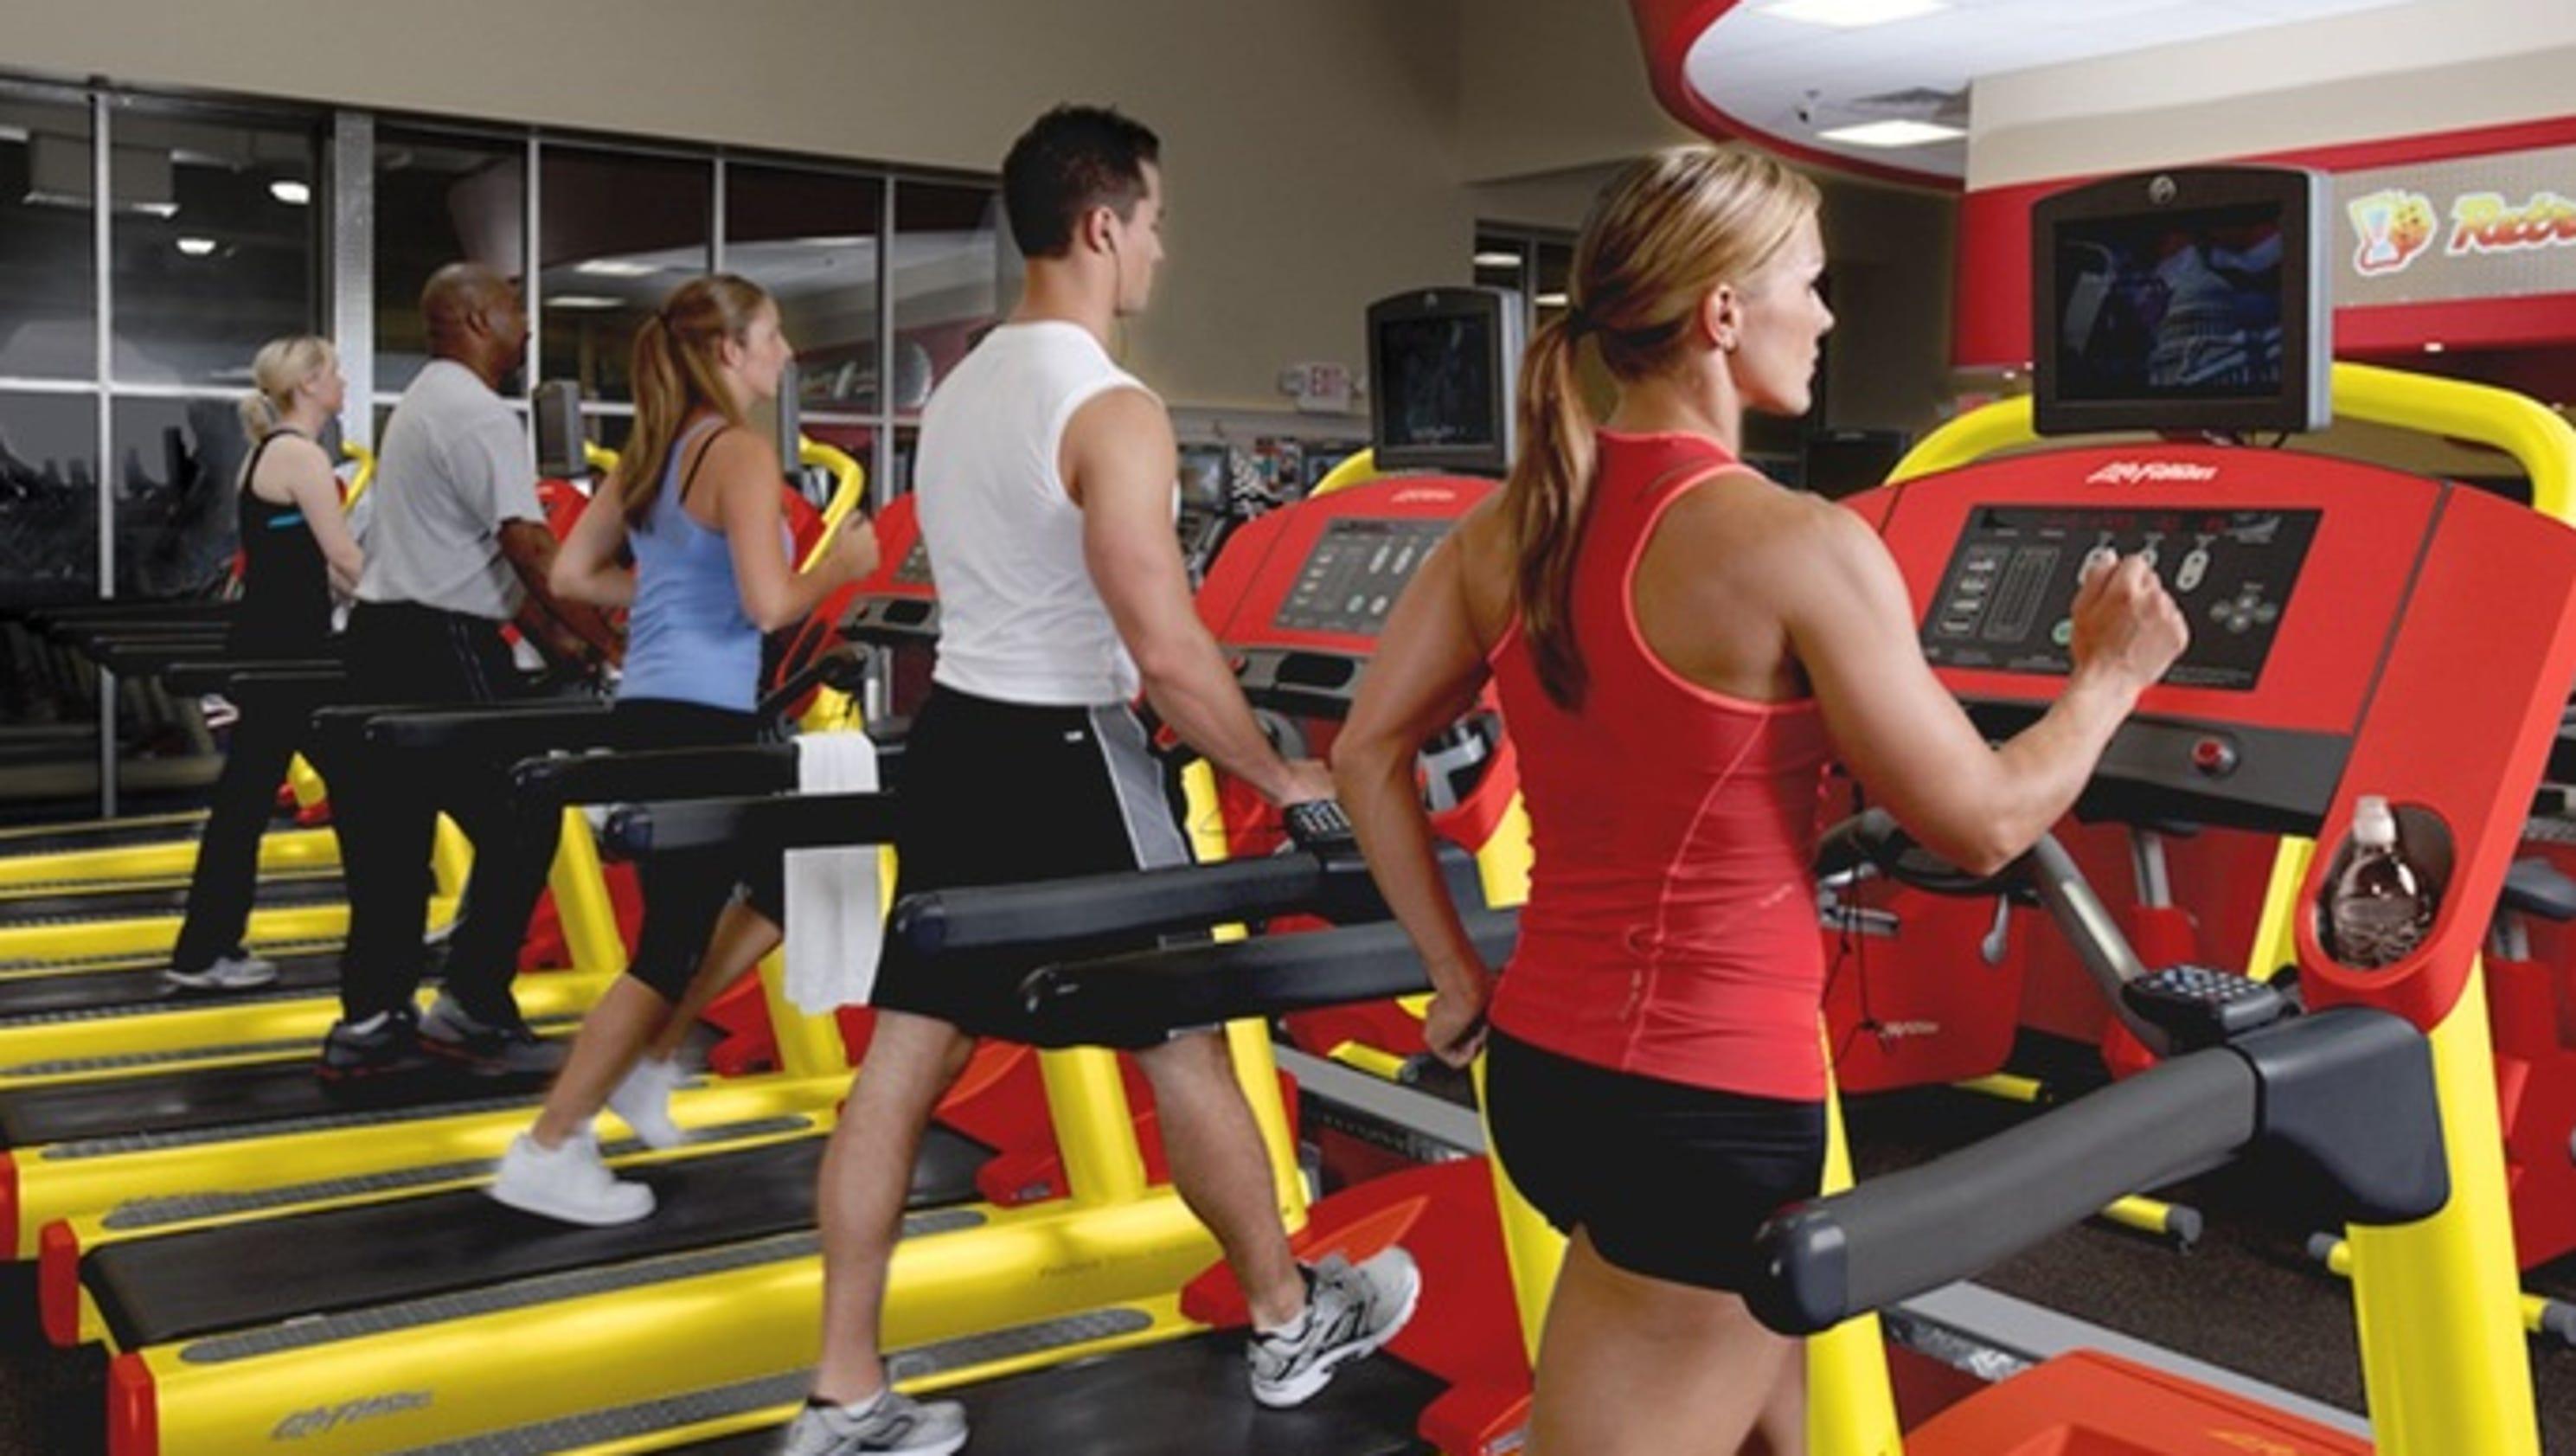 Gym membership giveaway for Gimnasio 60 entre 8 y 9